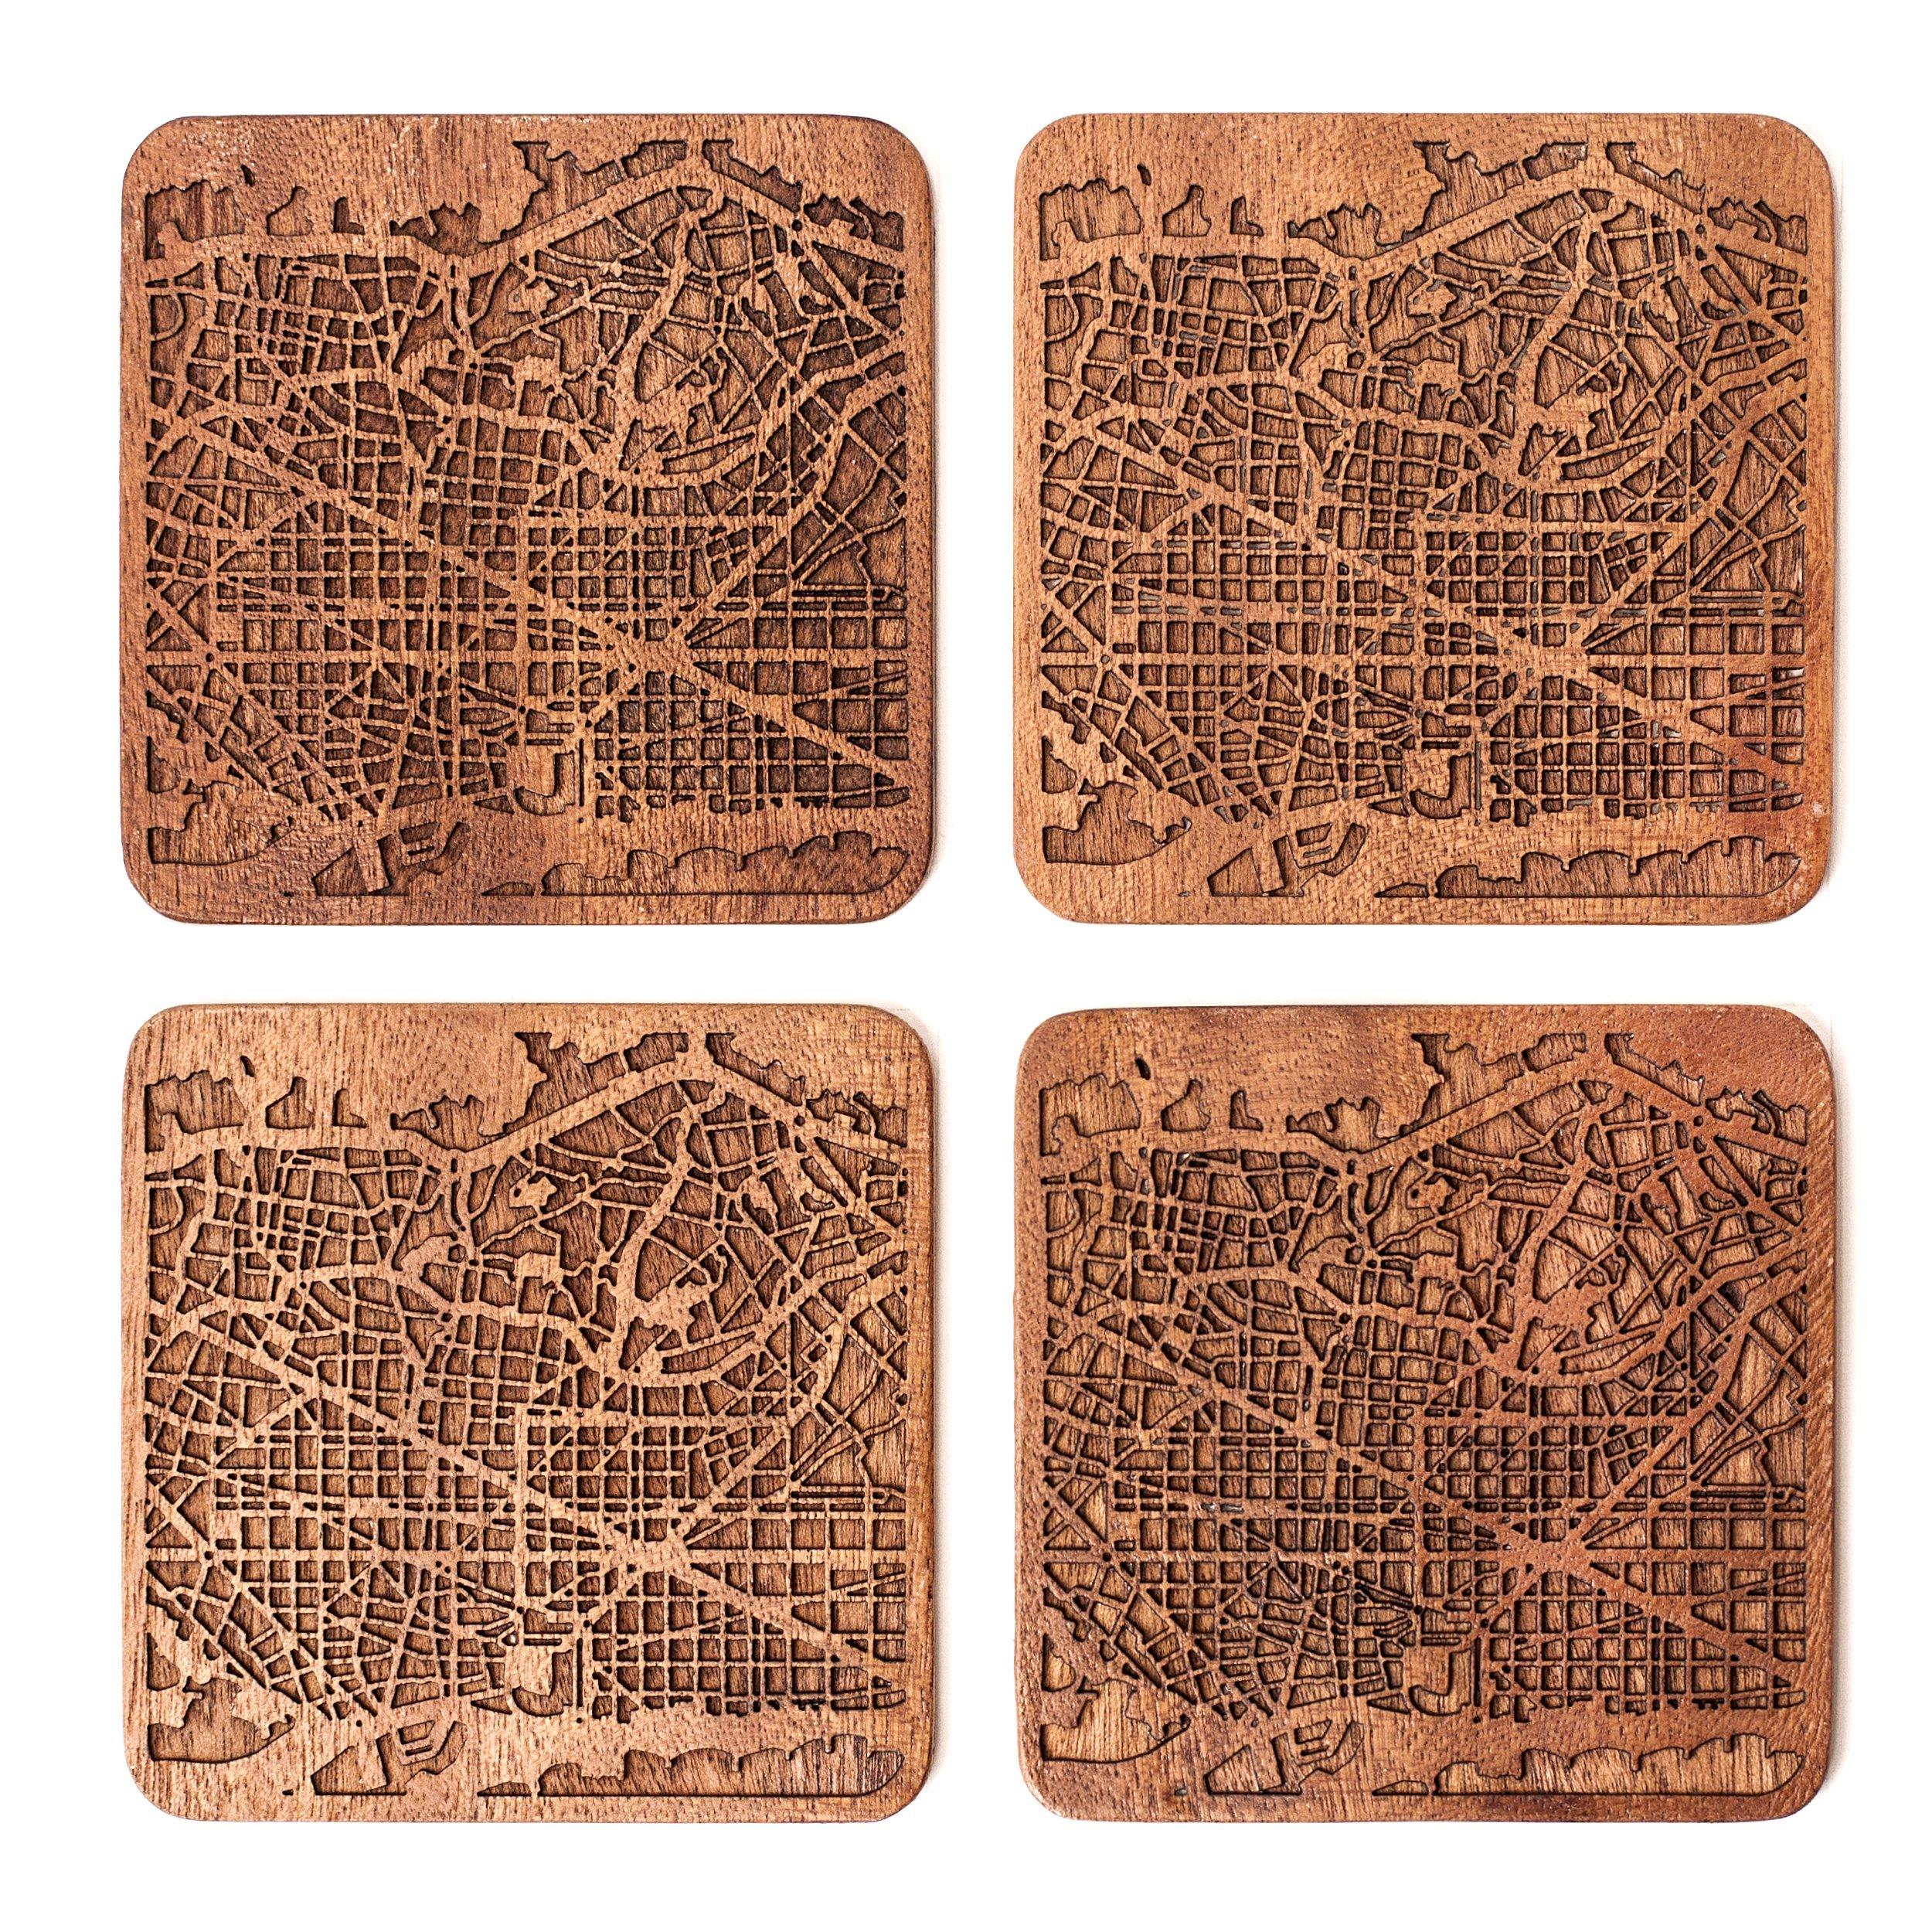 Barcelona Map Coaster by O3 Design Studio, Set Of